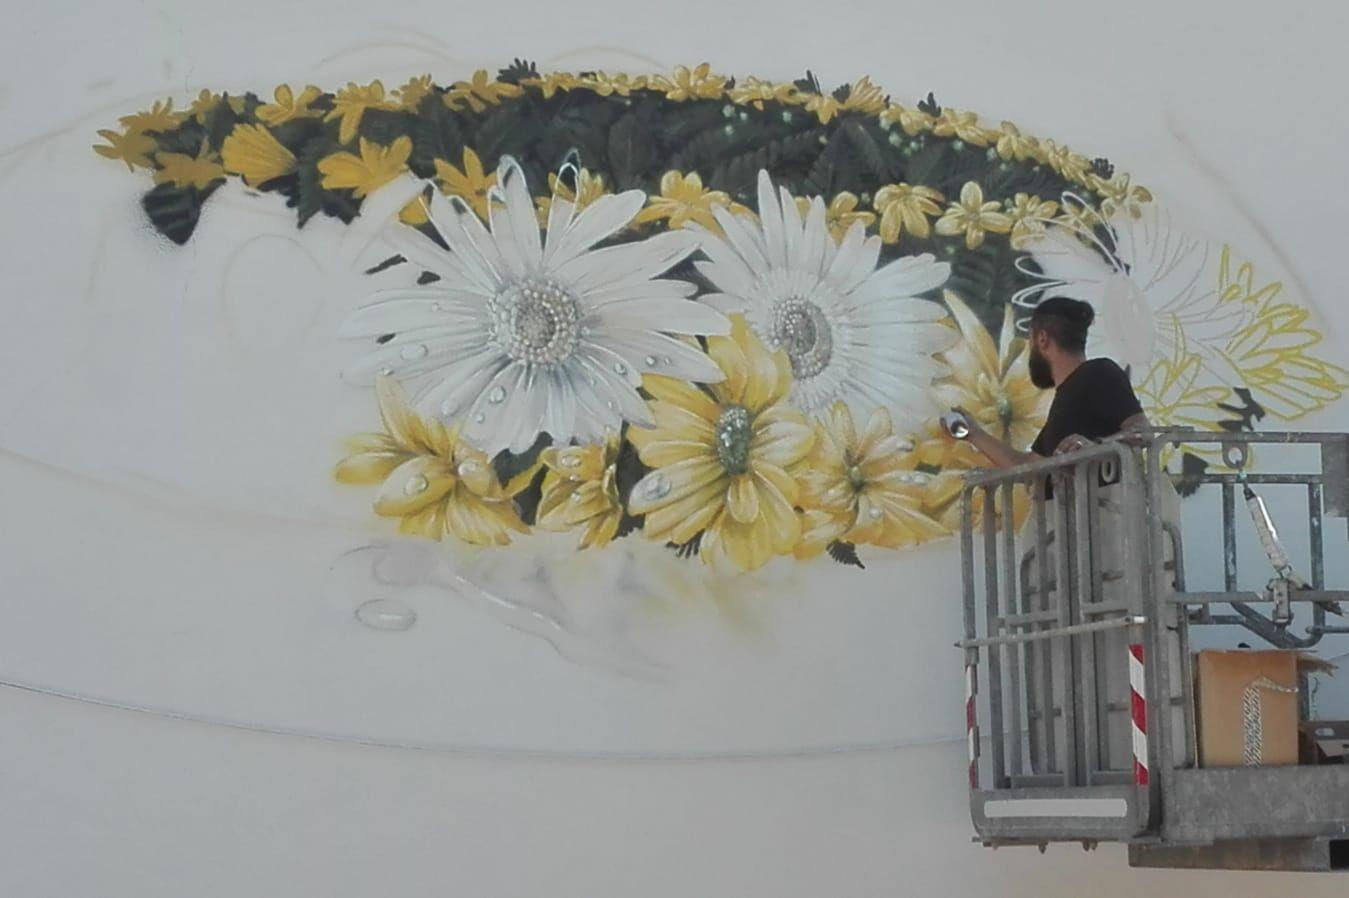 L'artista Neve lavora al murales in piazza Piave